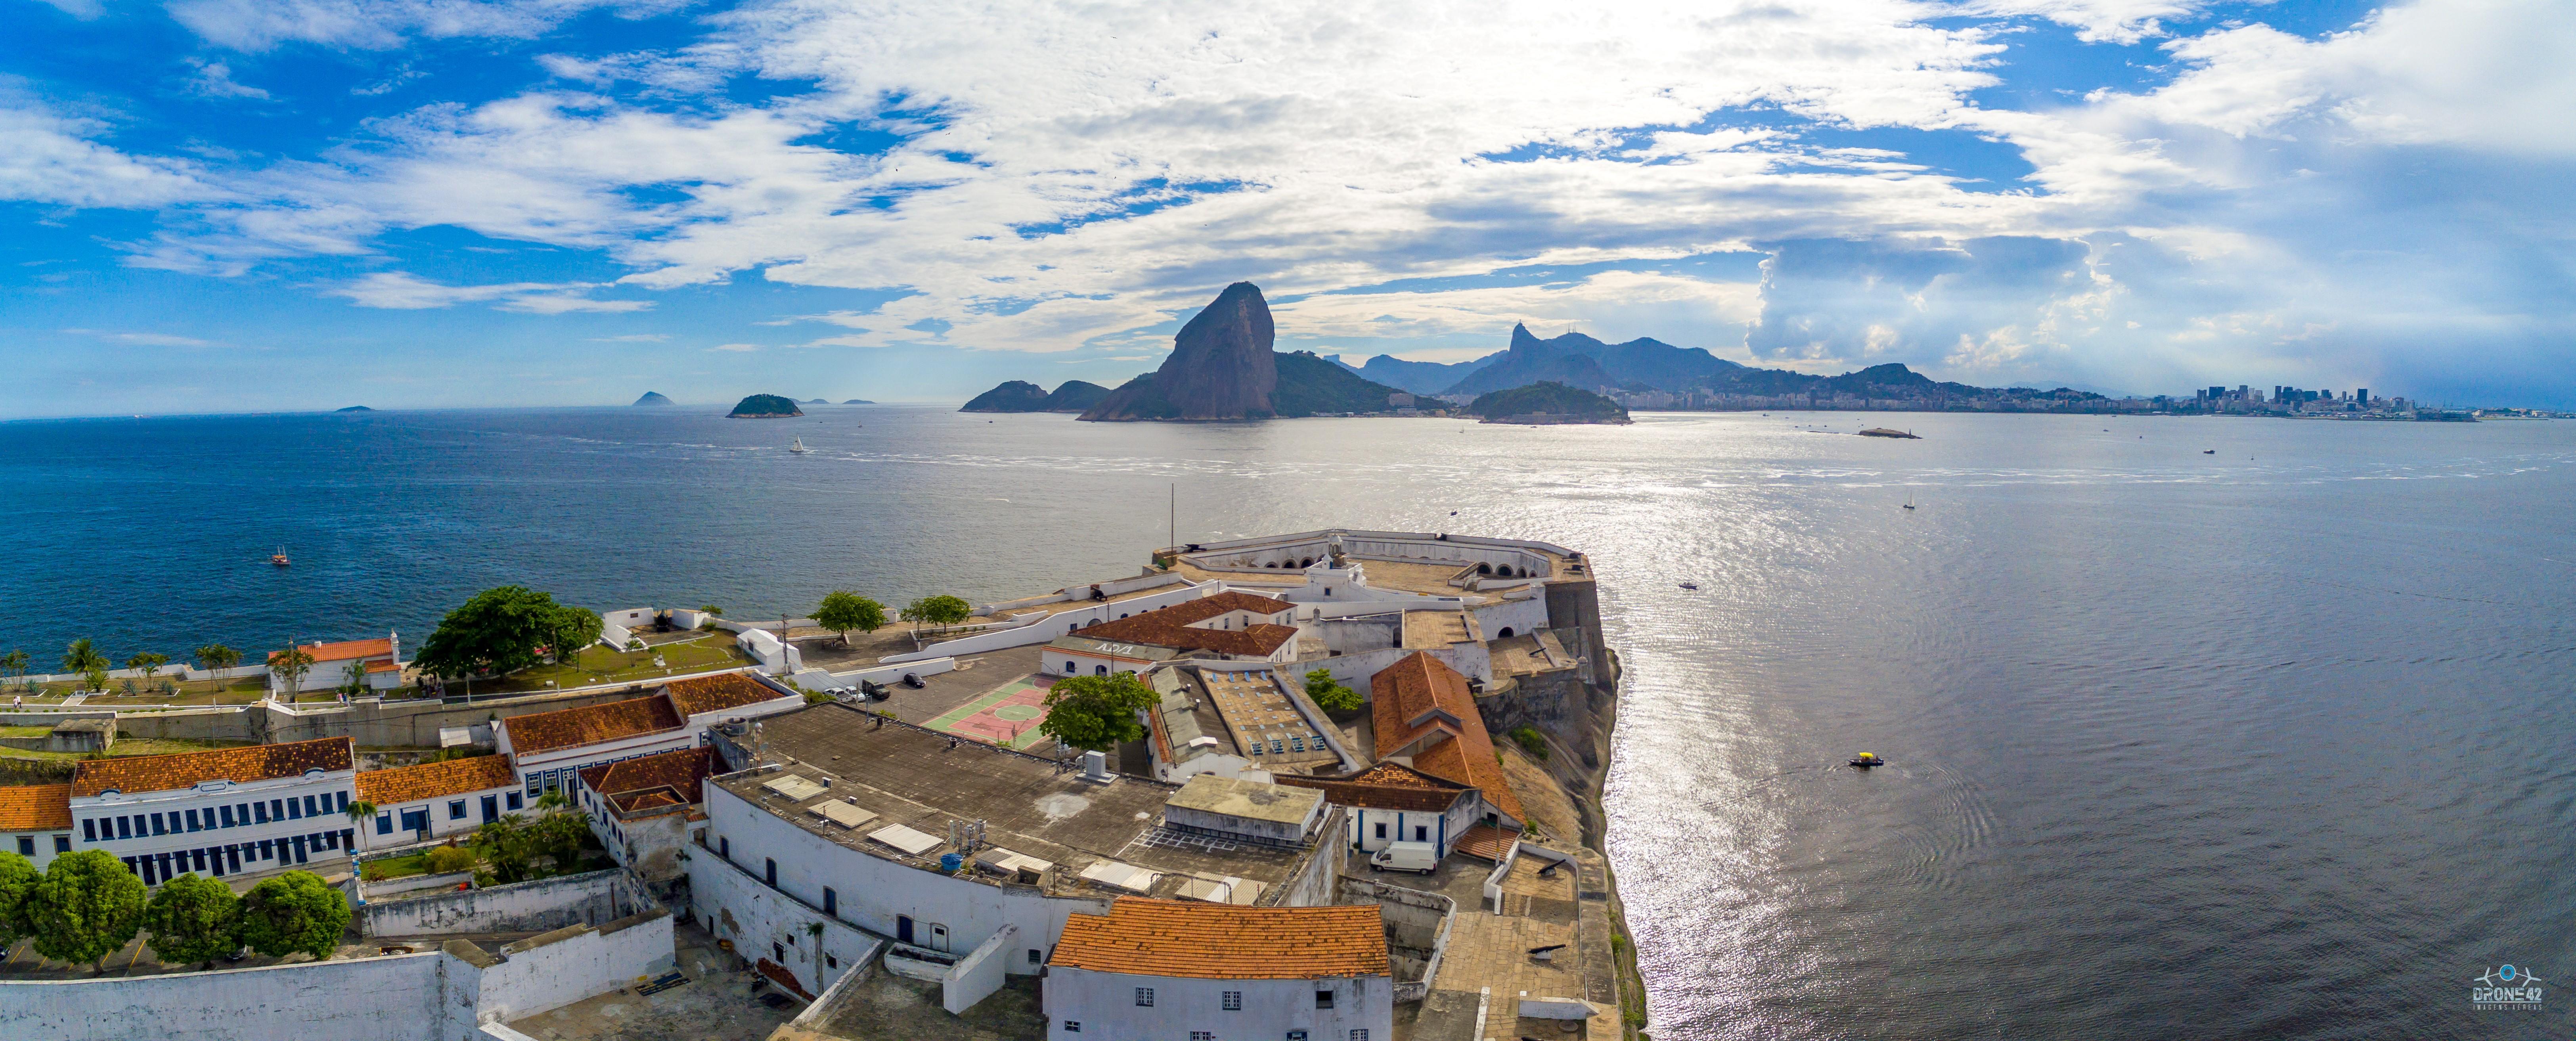 Fortaleza de Santa Cruz da Barra, Niterói, RJ, Brazil